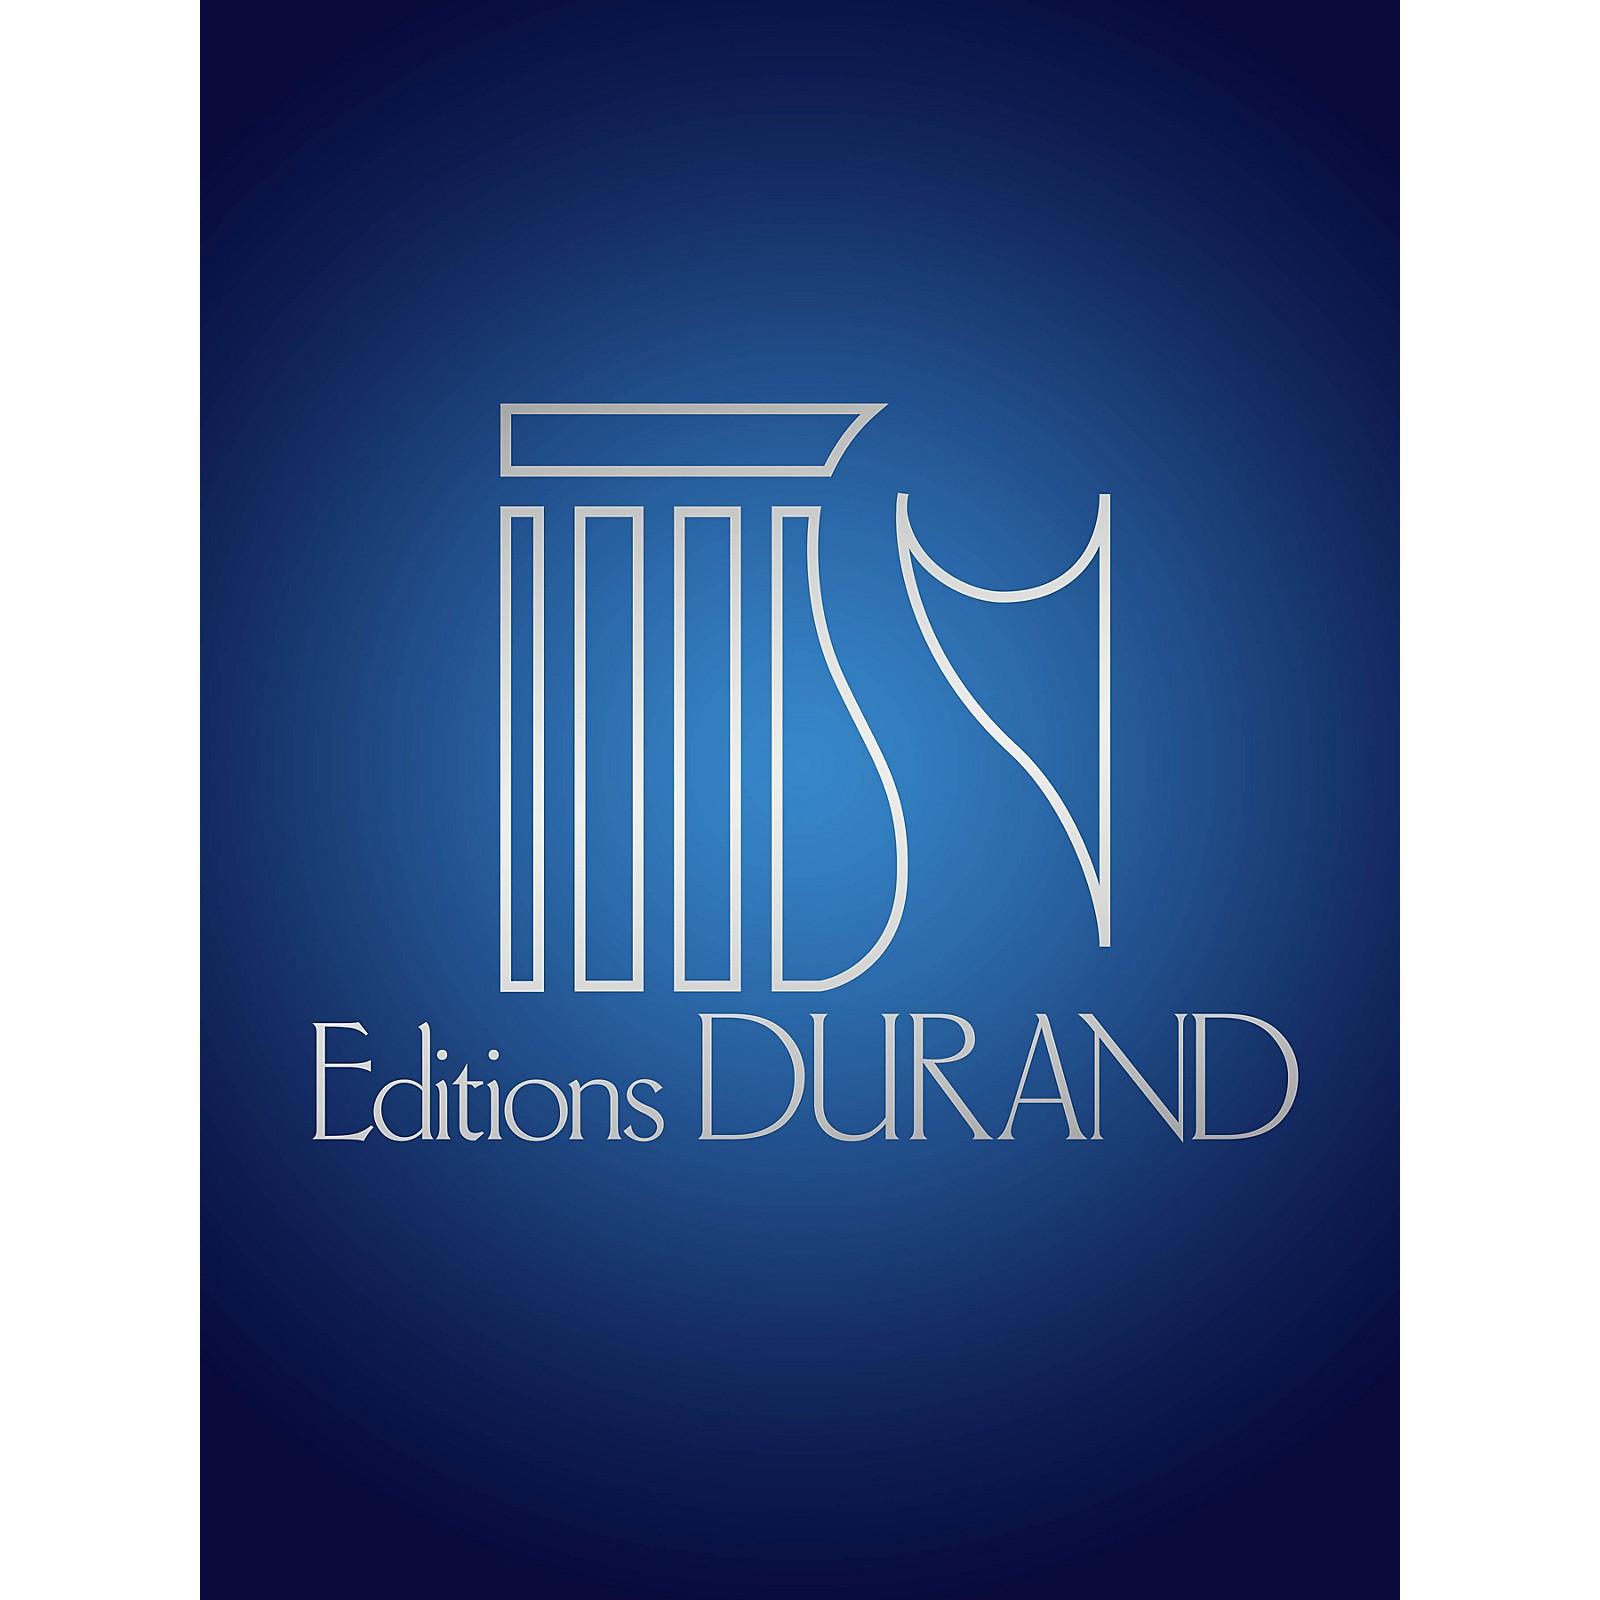 Editions Durand L'Opéra de quat'sous (Vocal Score) Editions Durand Series Composed by Kurt Weill